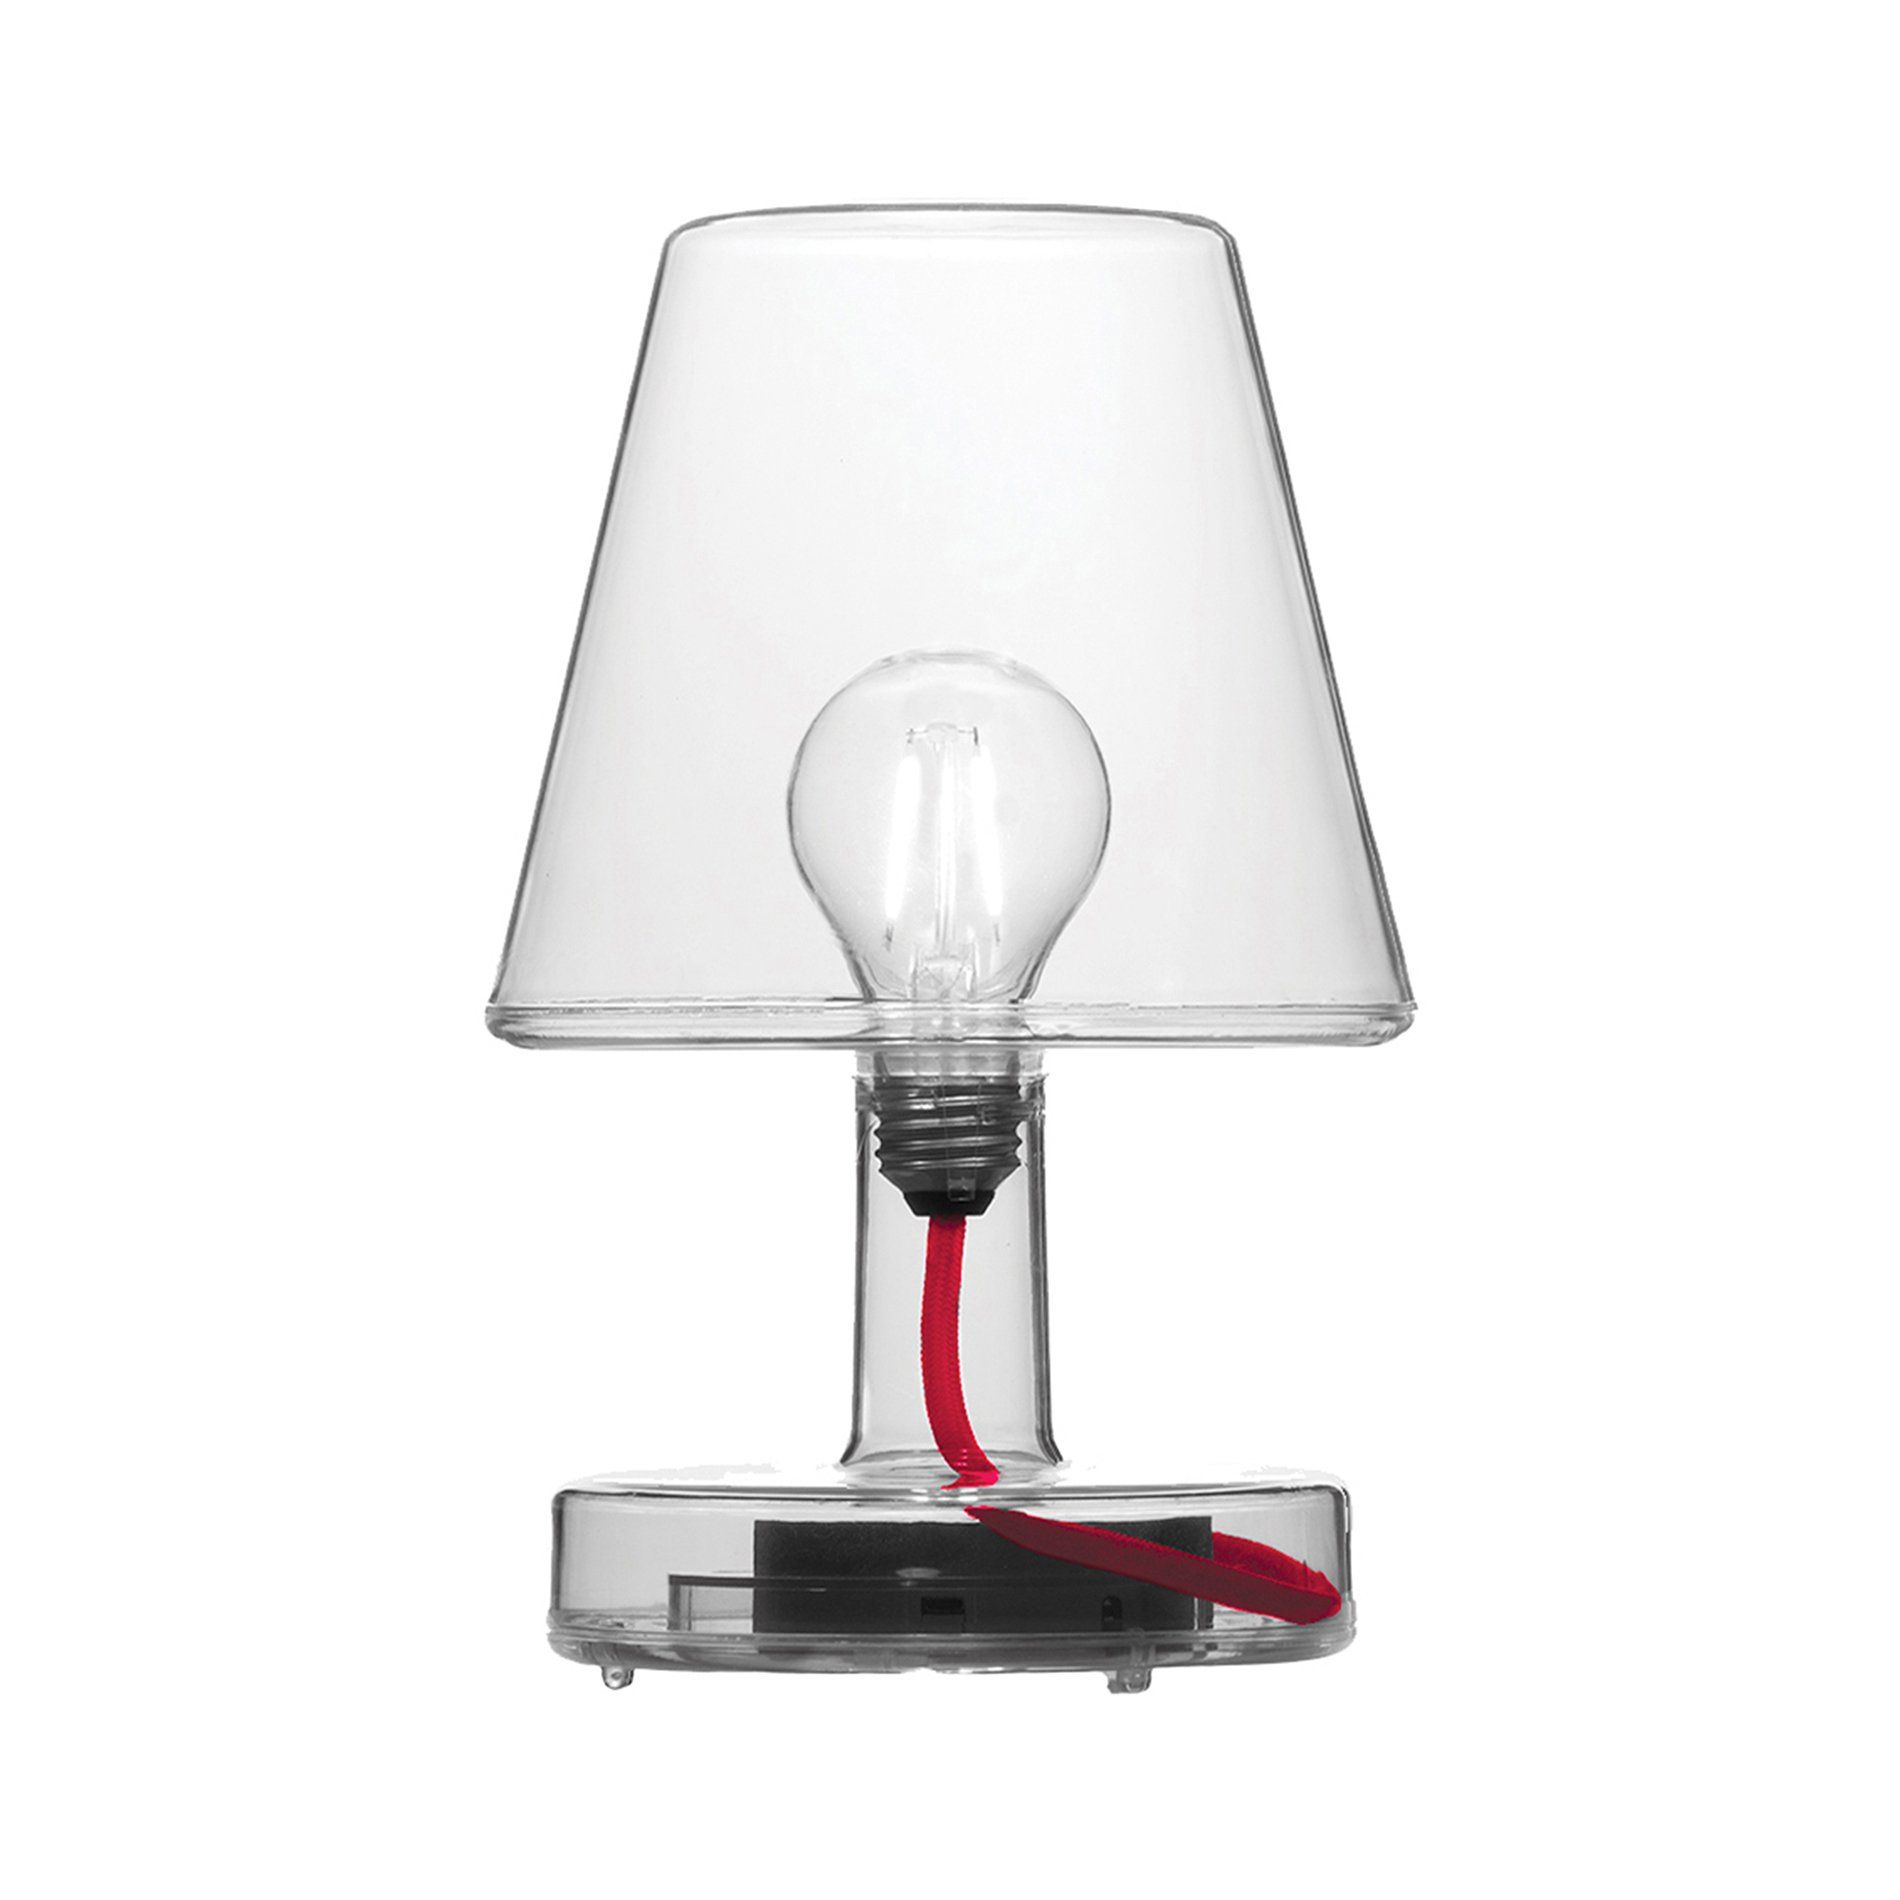 Transloetje Table Lamp Table Lamp Lamp Modern Table Lamp